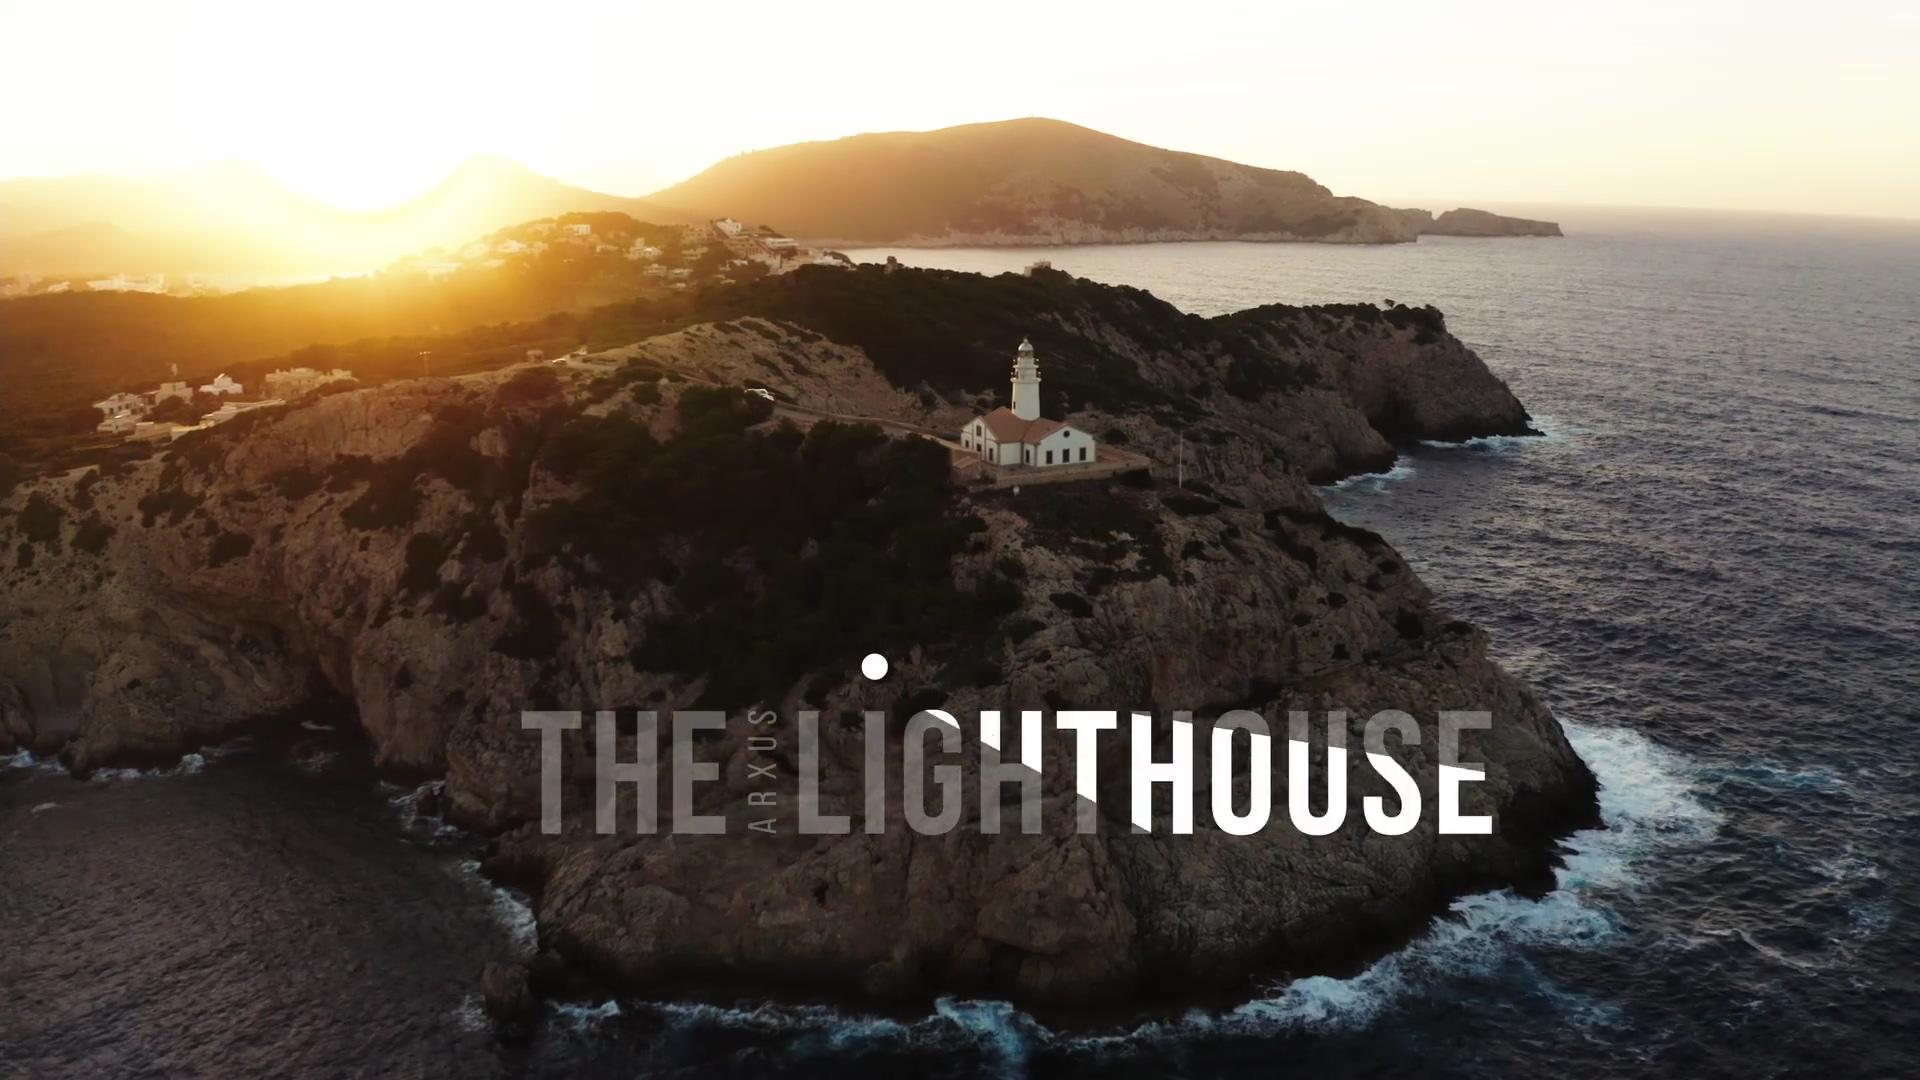 Arxus - The Lighthouse - Cloud Migration